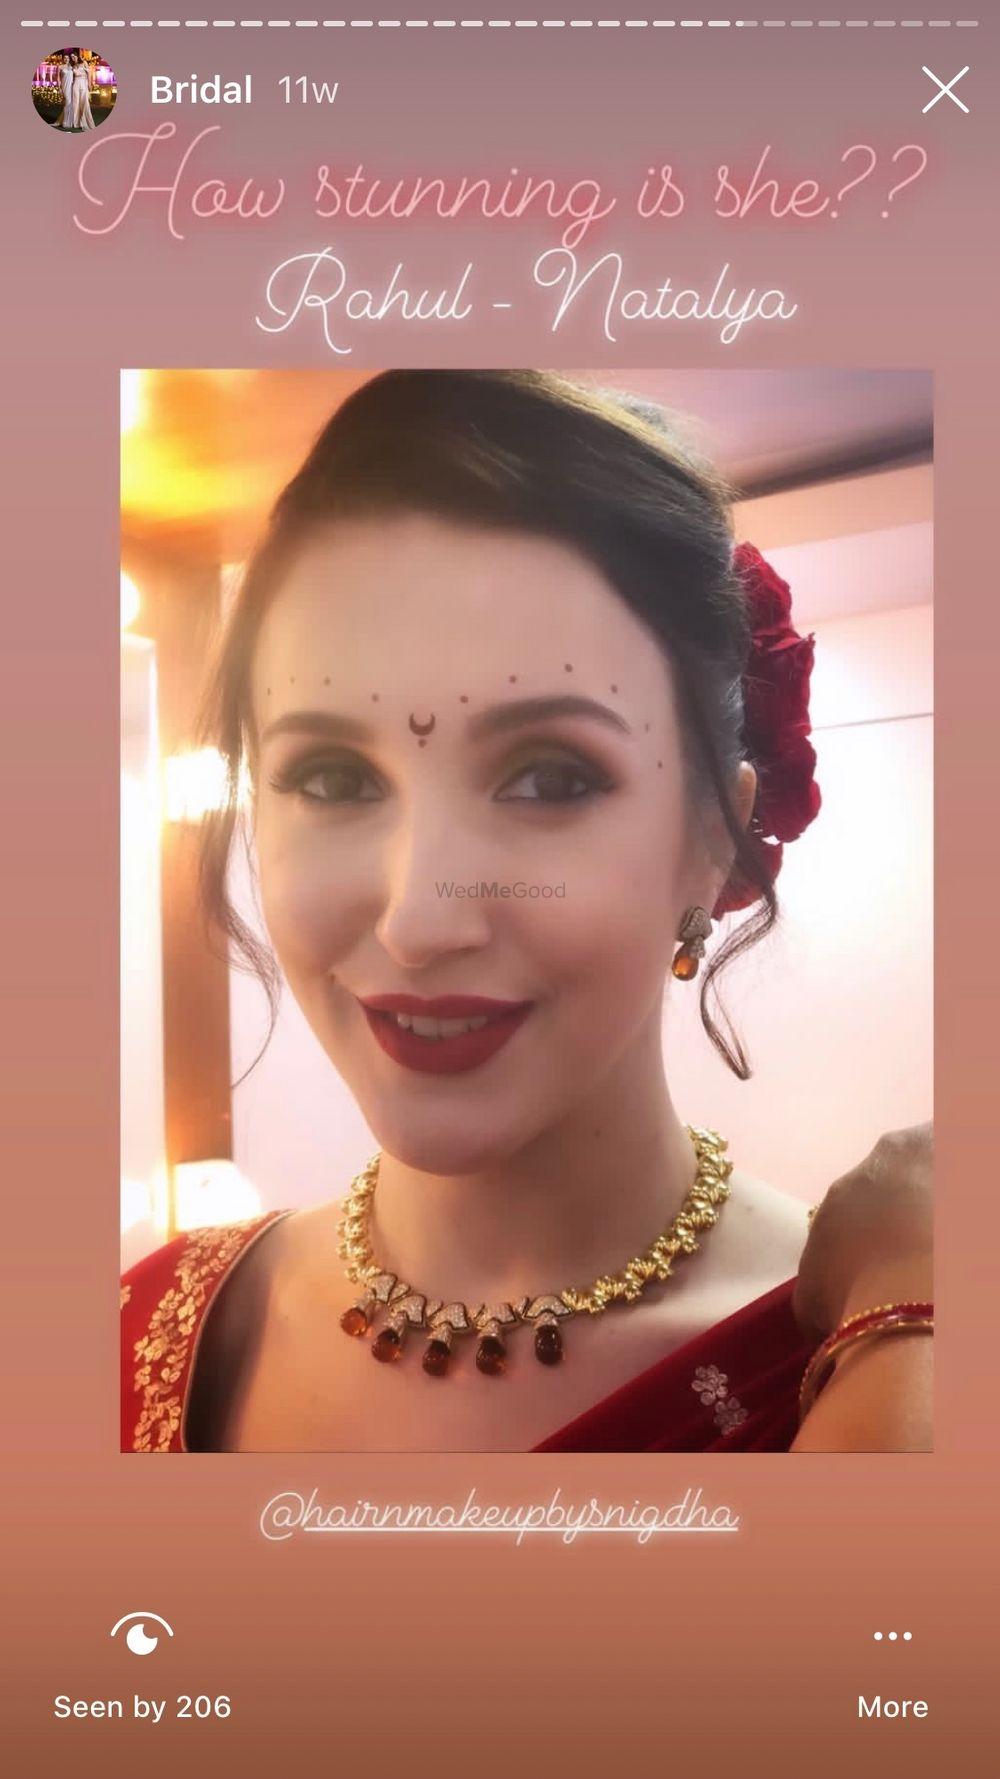 Photo From Rahul Mahajan Weds Natalia - By Monika Dey Makeup and Hair